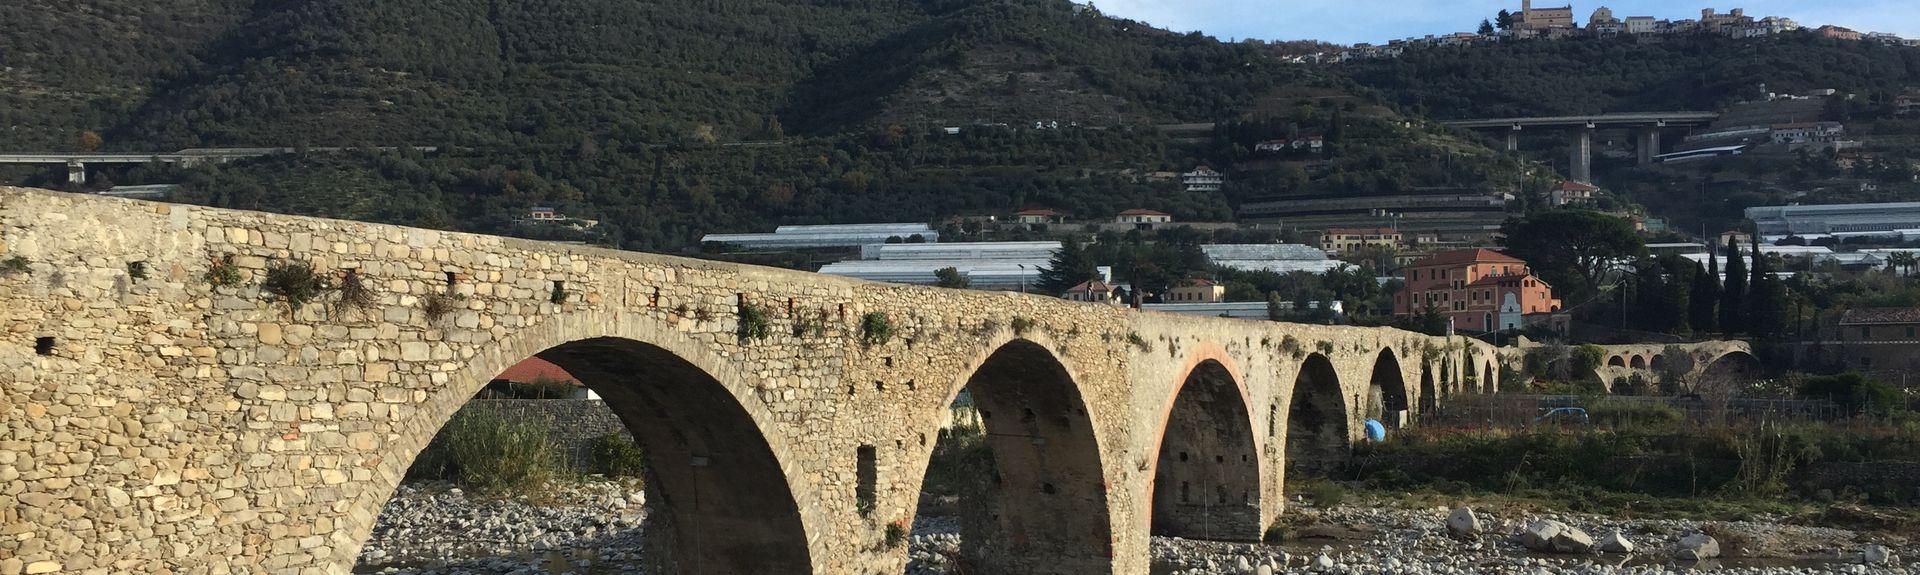 Perinaldo, Liguria, Italia